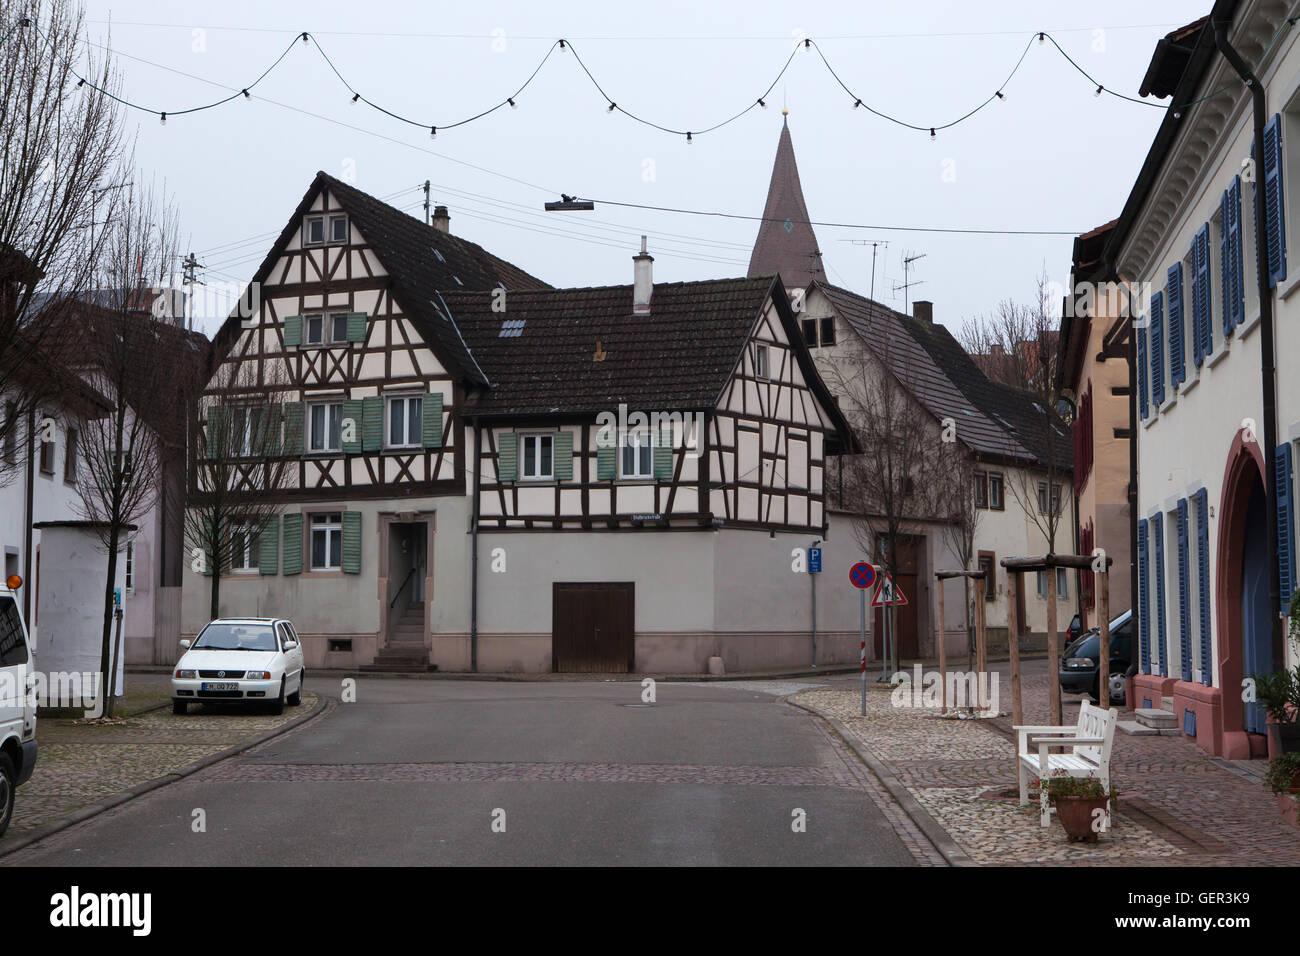 Traditional half-timbered houses in Endingen am Kaiserstuhl, Baden-Wurttemberg, Germany. - Stock Image